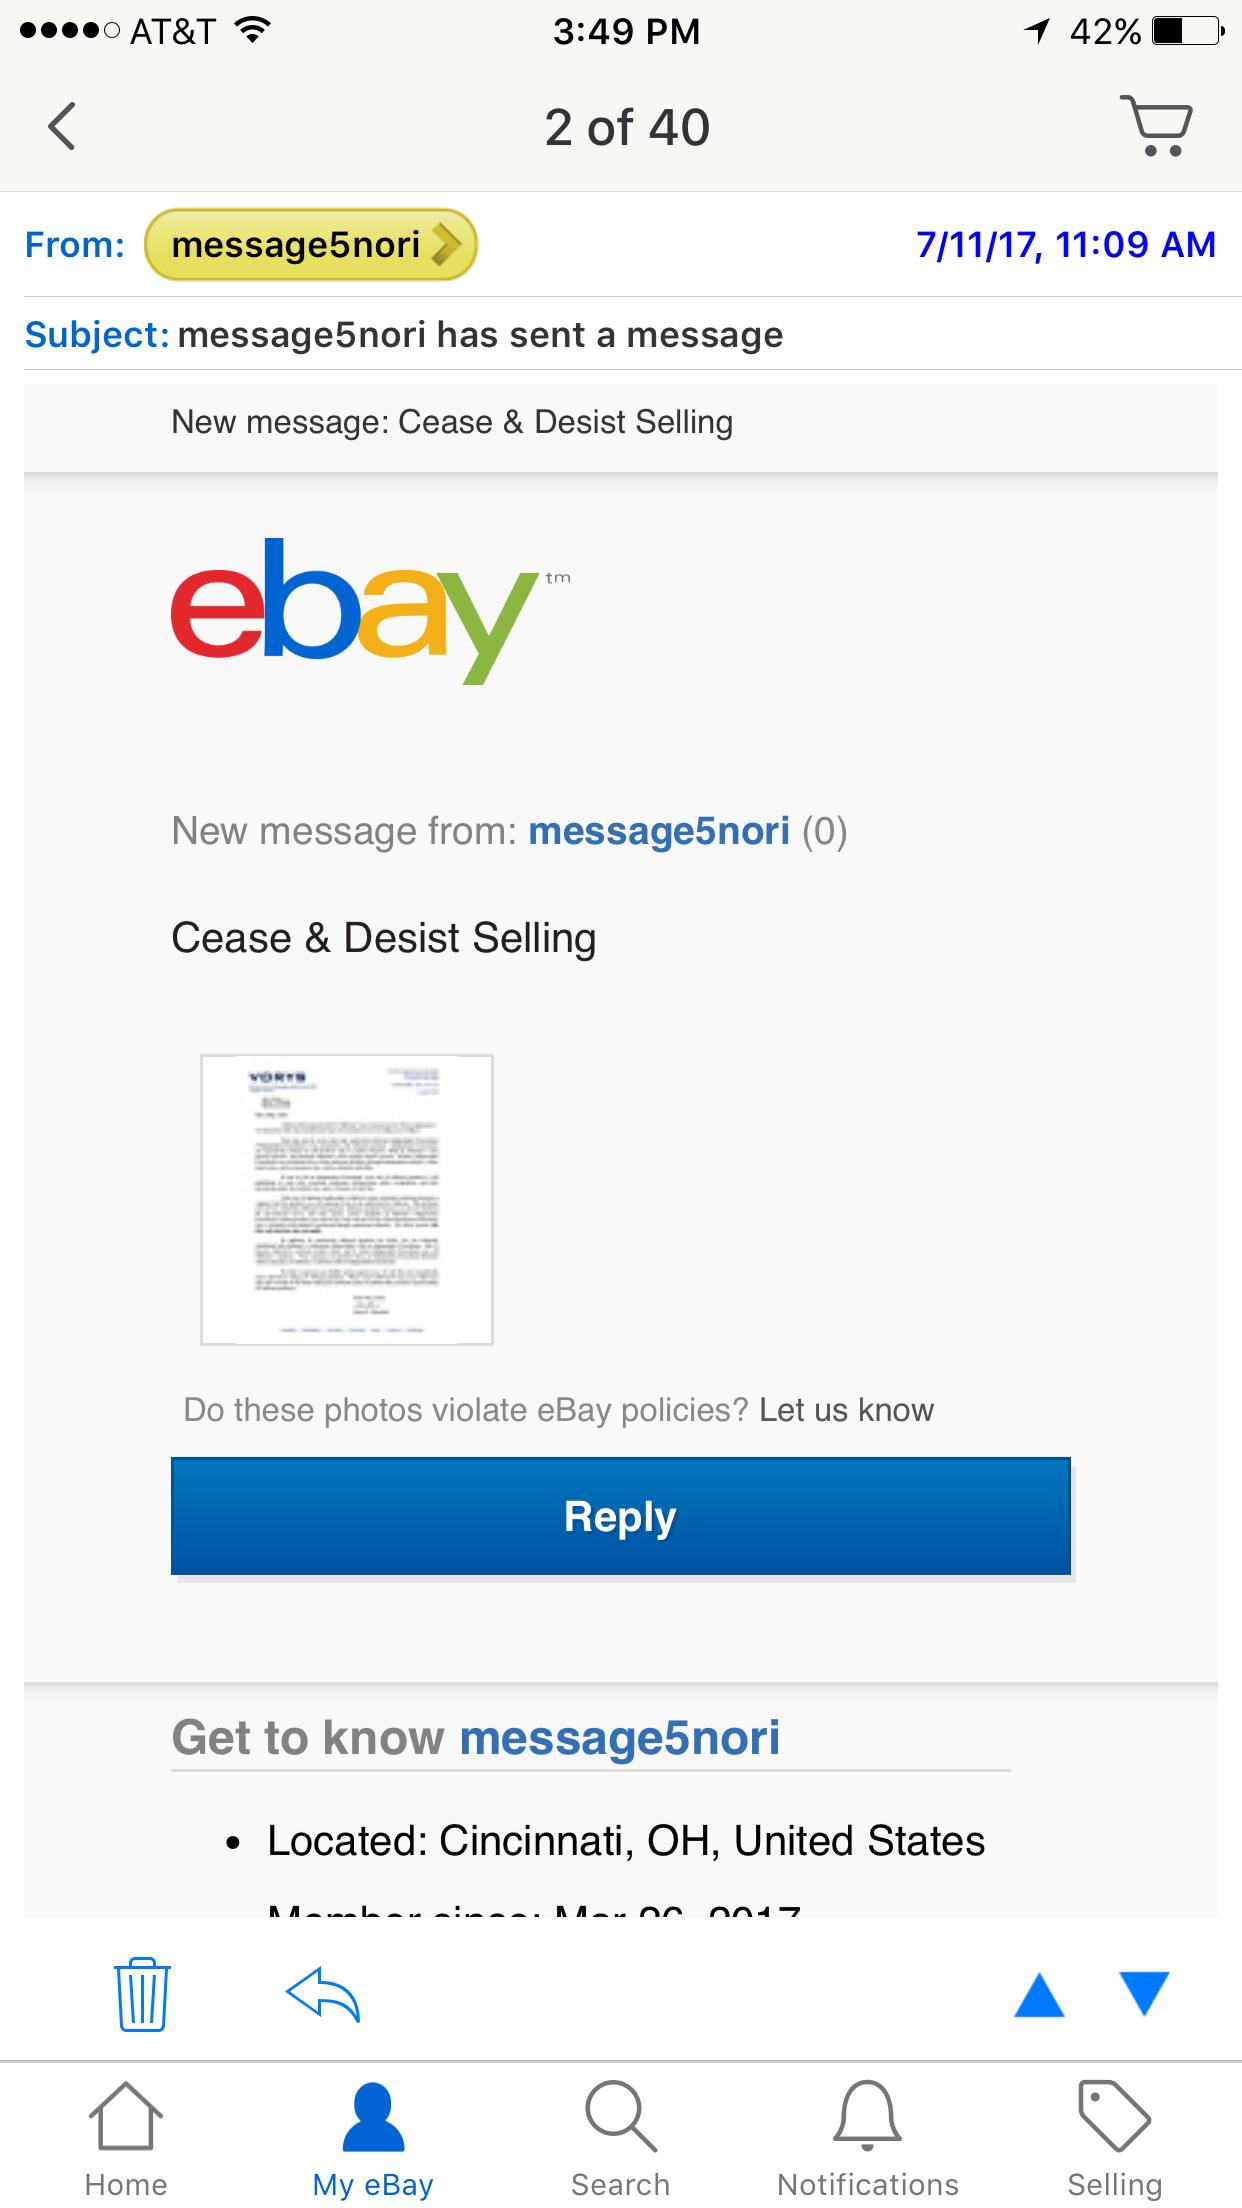 Vorys cease & desist letter for arbonne lotion i p The eBay